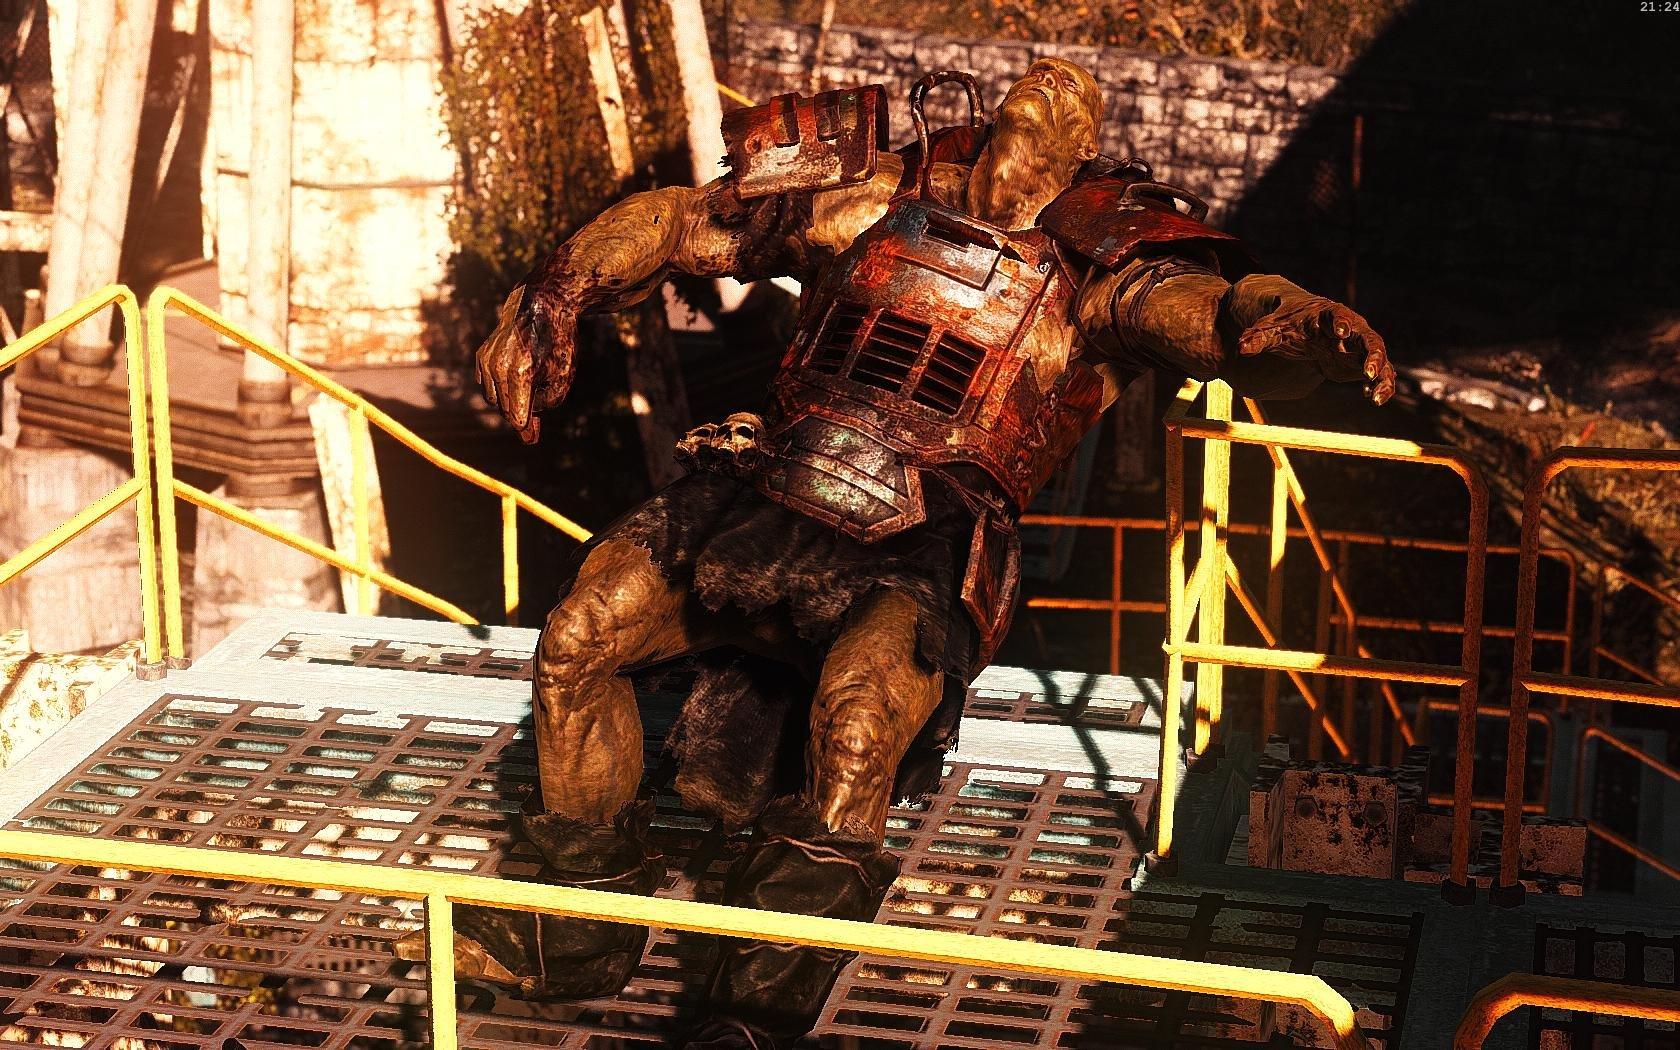 Fallout4 2019-02-03 21-24-30-92